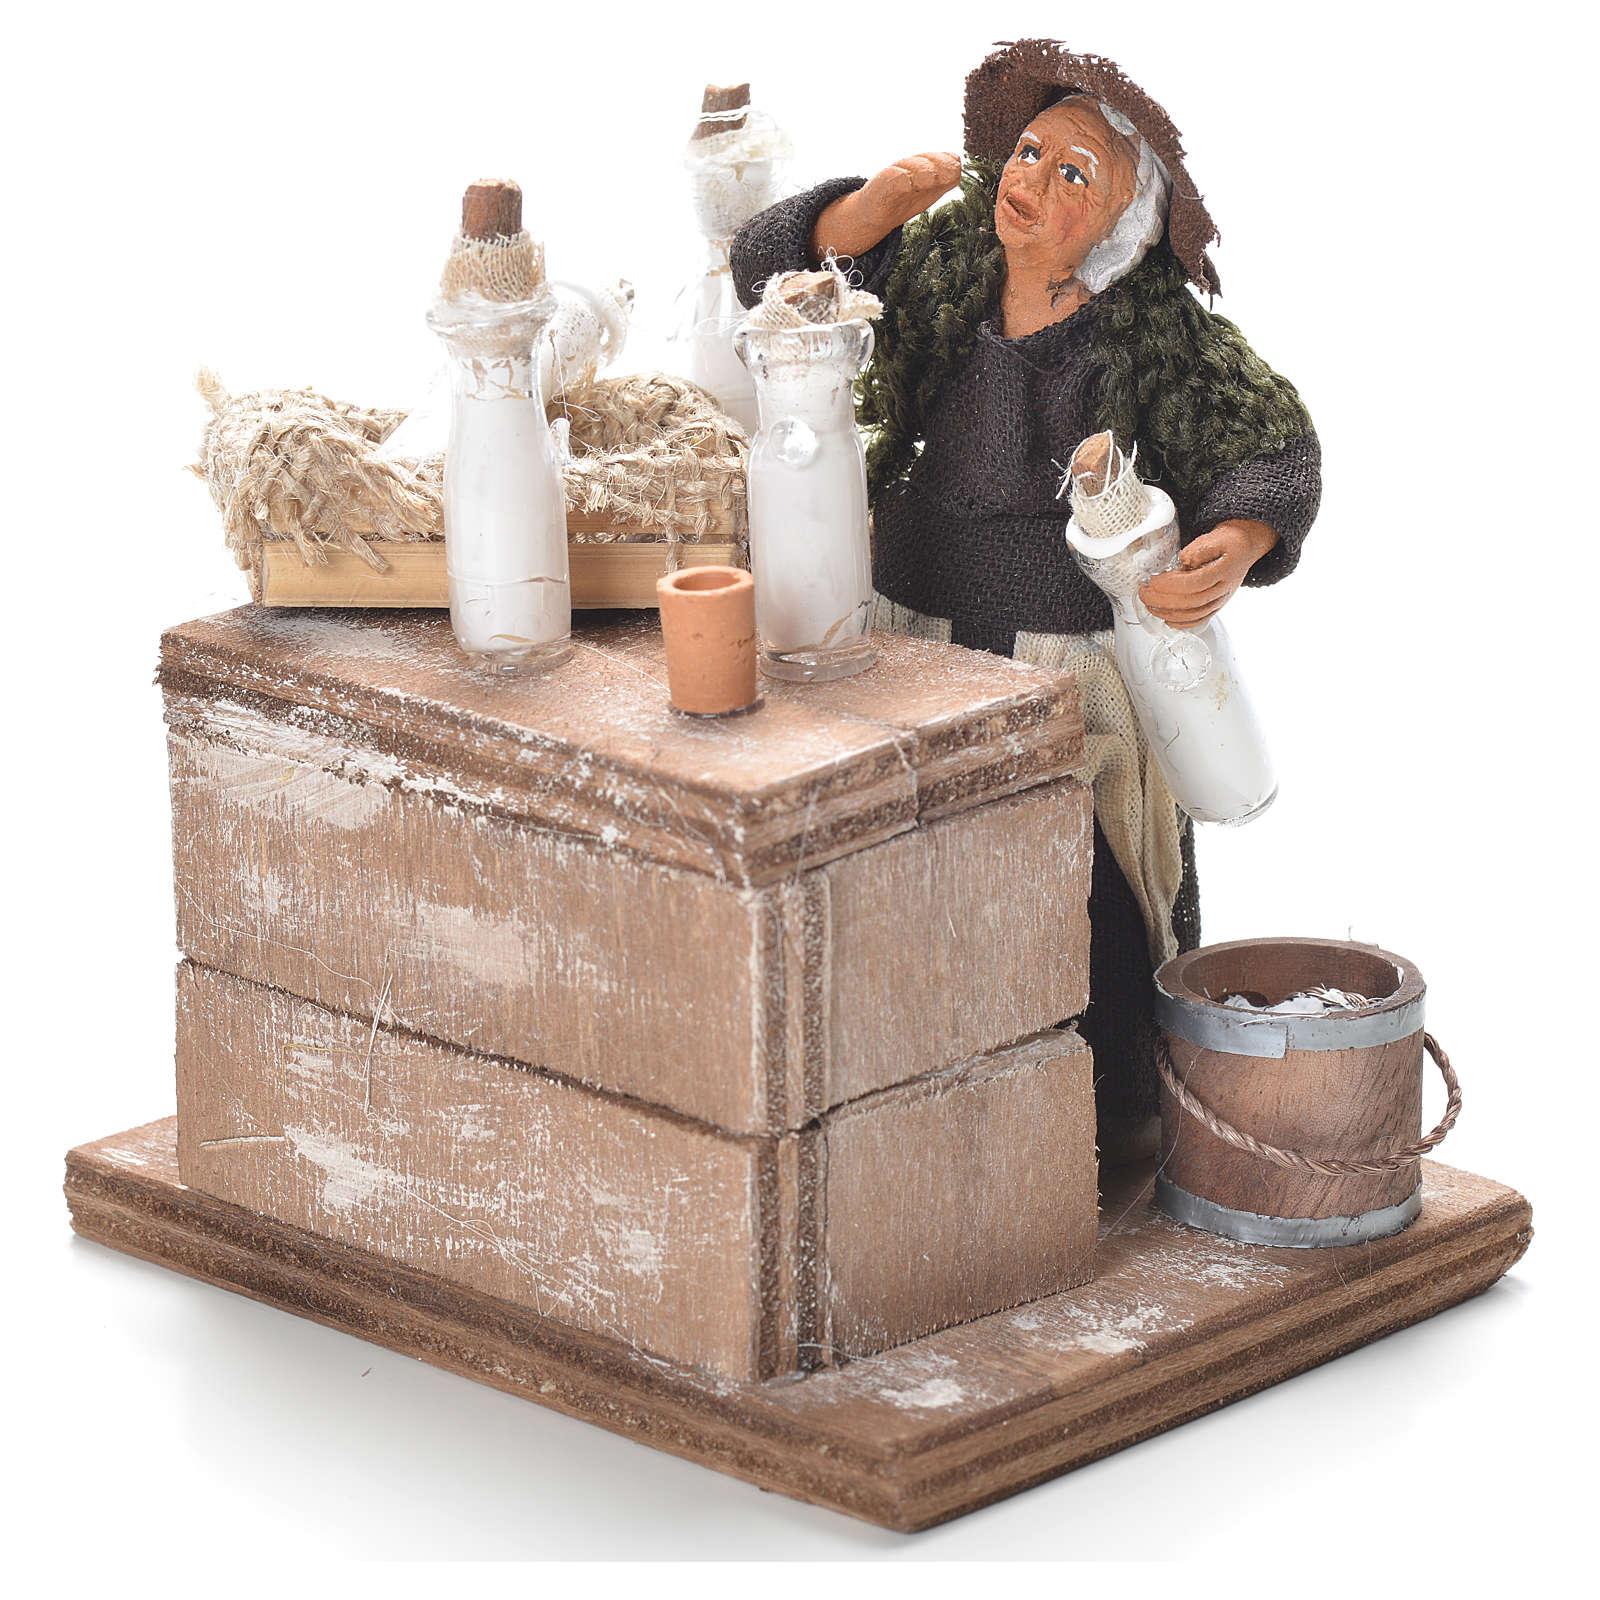 Milk woman with stall, Neapolitan Nativity 12cm 4